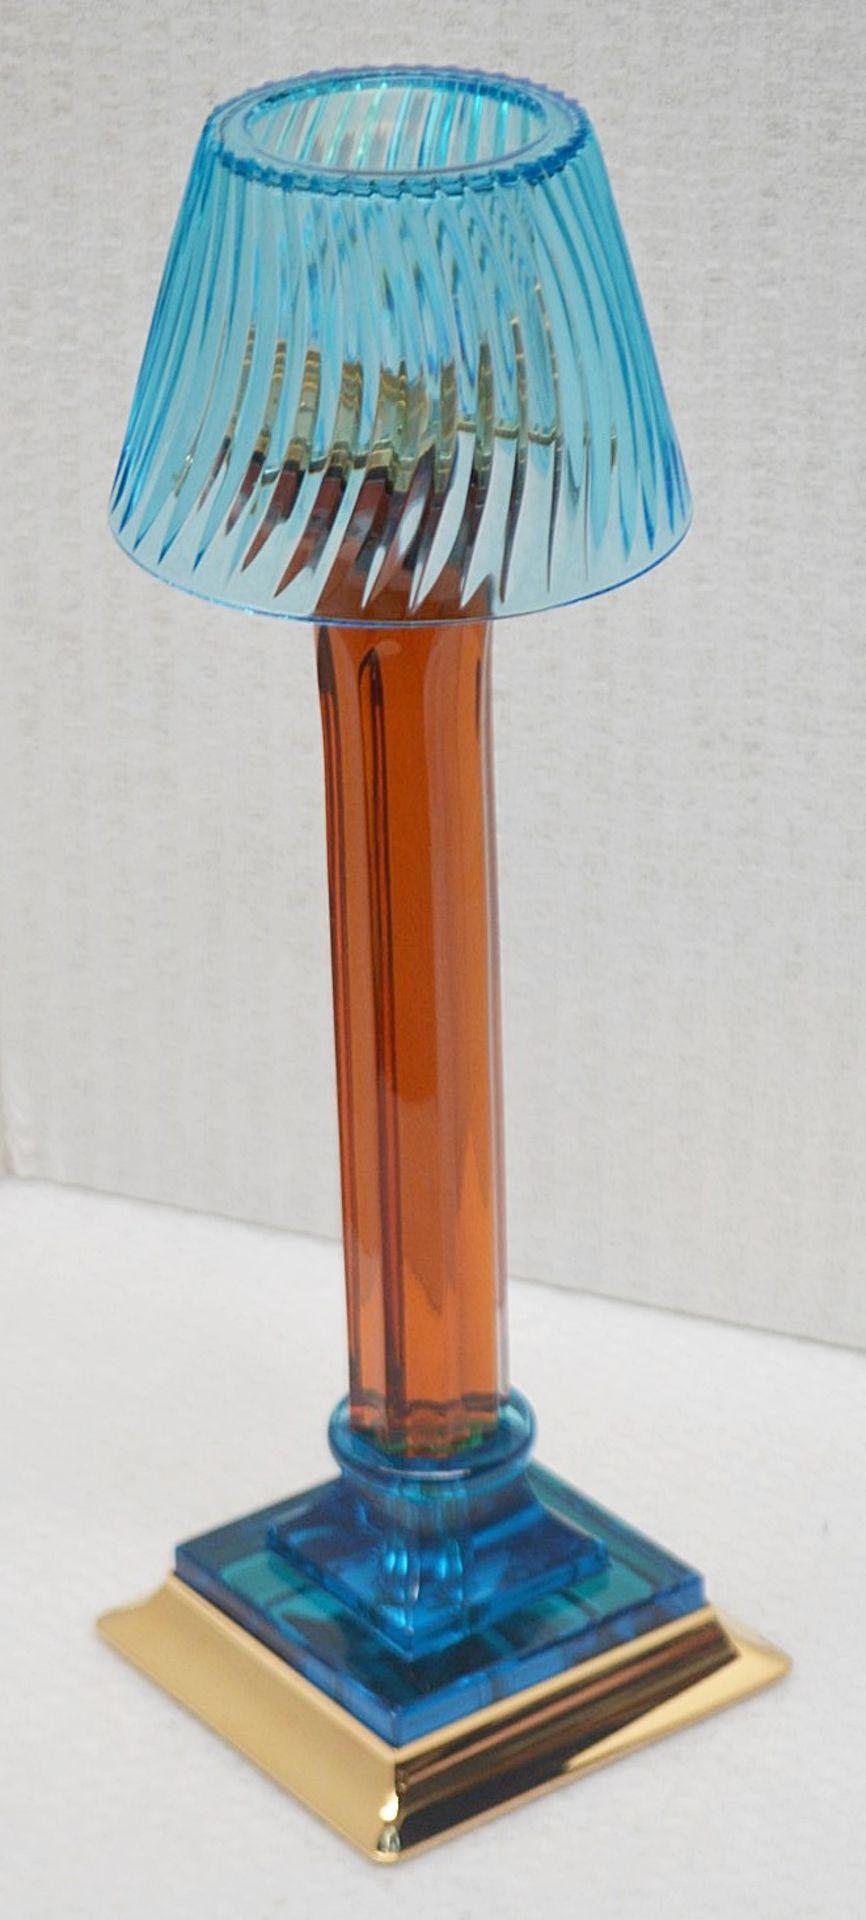 1 x BALDI 'Home Jewels' Italian Hand-crafted Candle Stick In Aquamarine & Amber Crystal - RRP £1,230